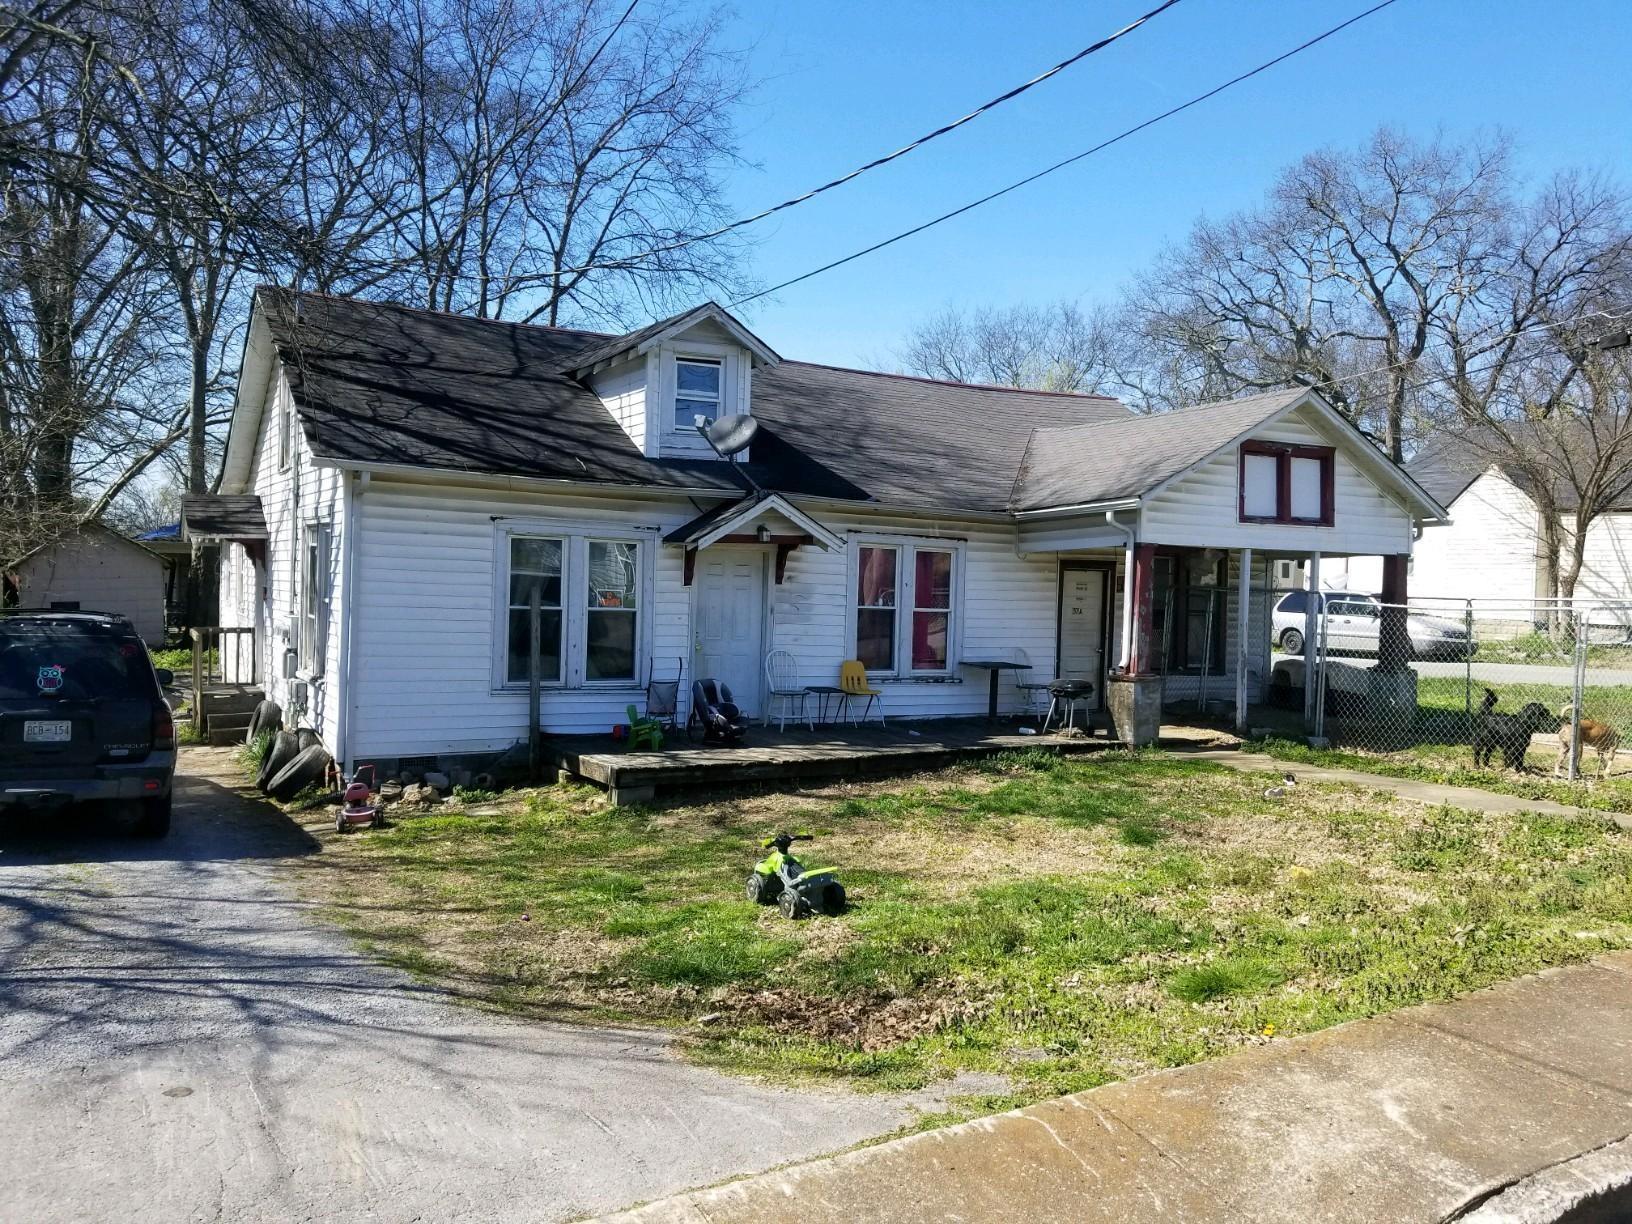 600 Moody St, Shelbyville, TN 37160 - Shelbyville, TN real estate listing